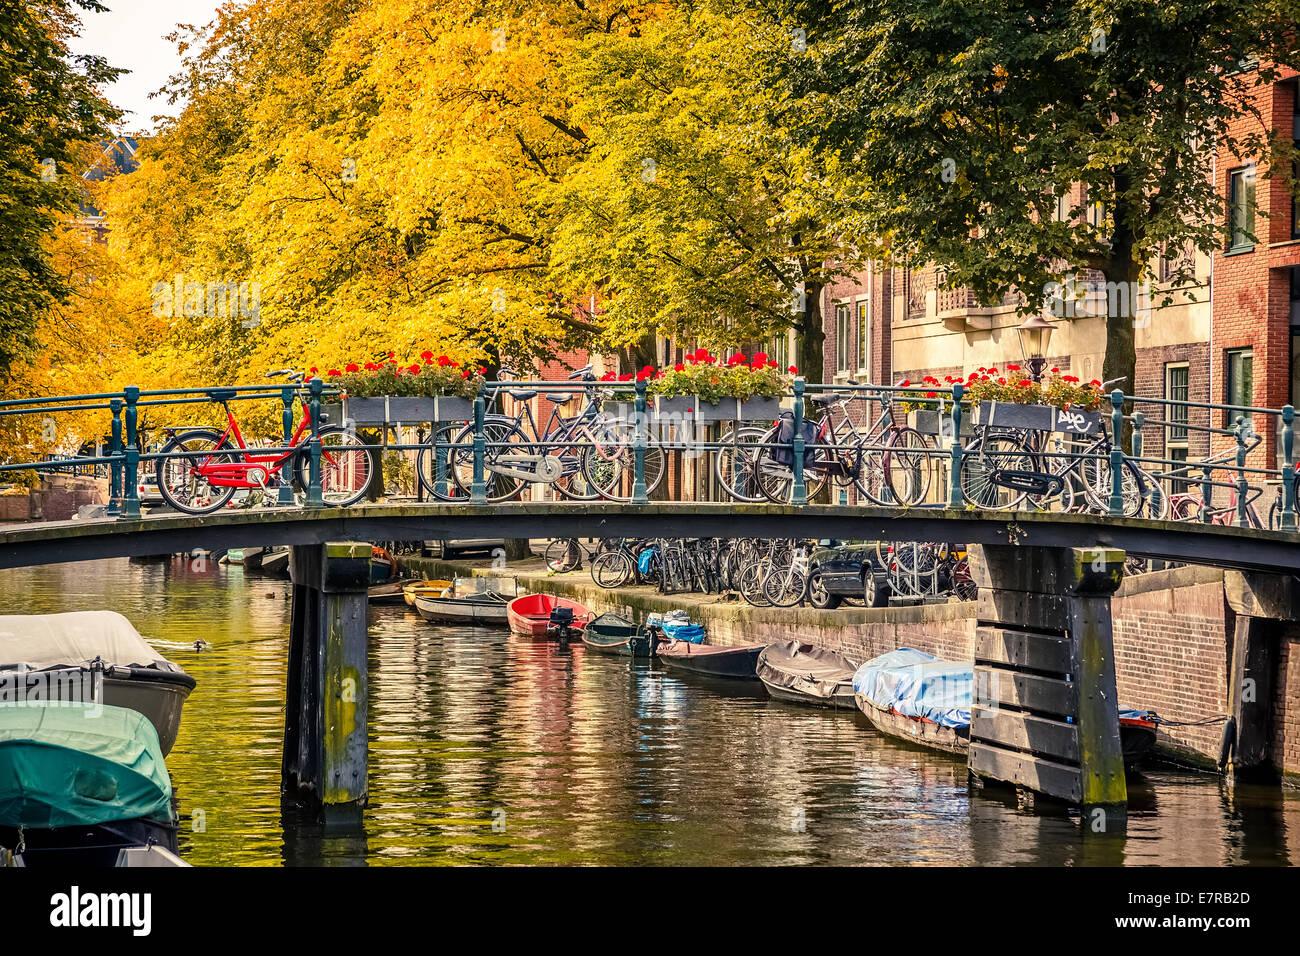 Canal in Amsterdam Immagini Stock